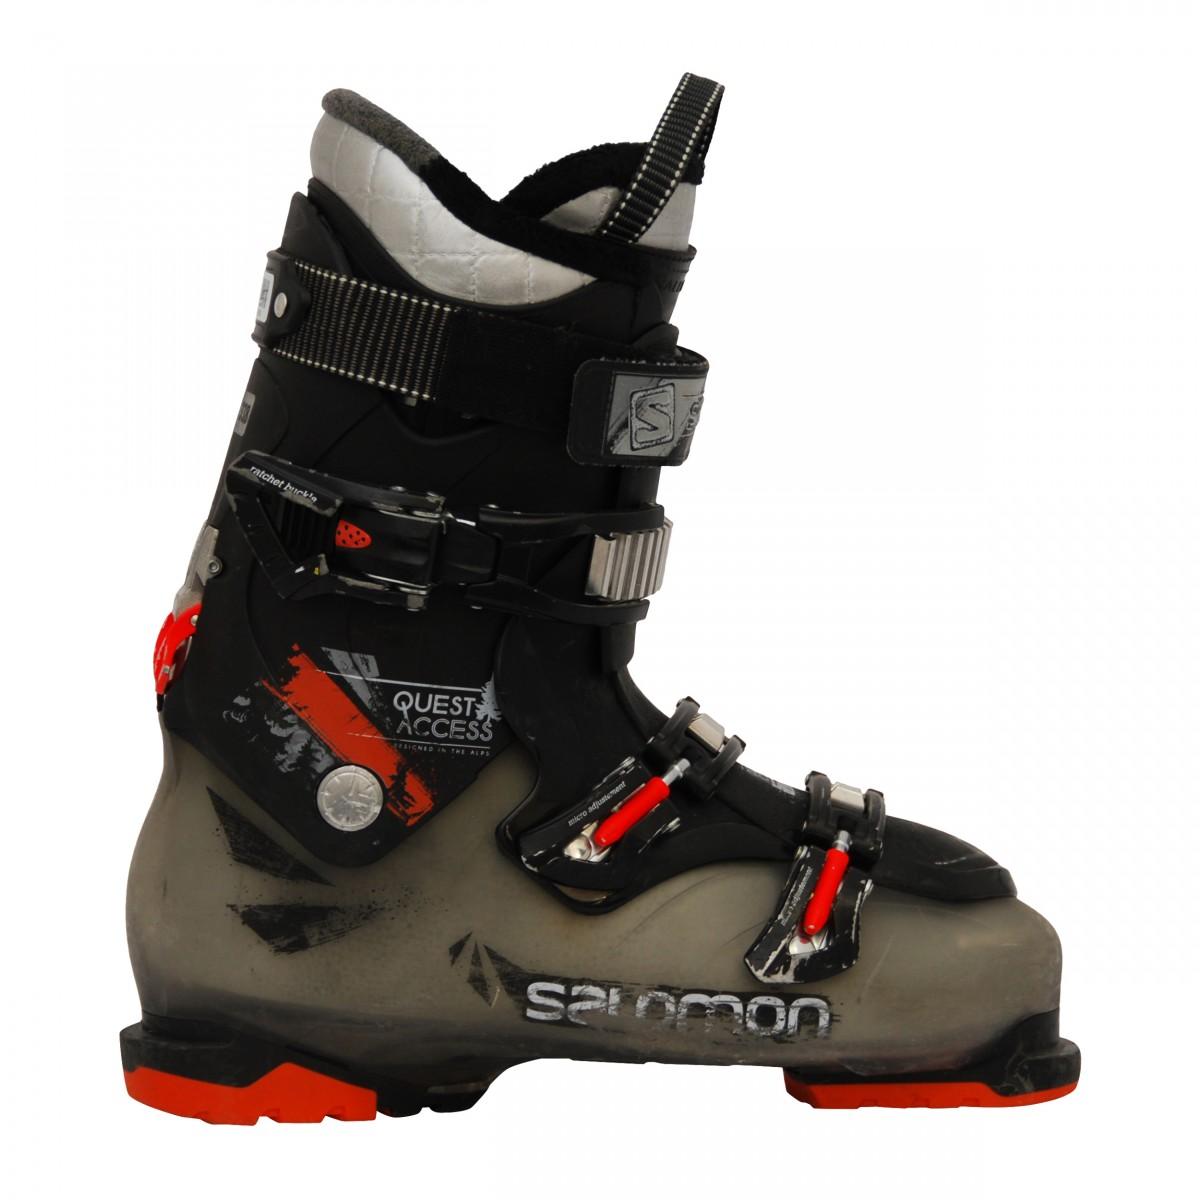 Salomon Quest Access 770 W Ladies Ski Boots **GOOD CONDITION**